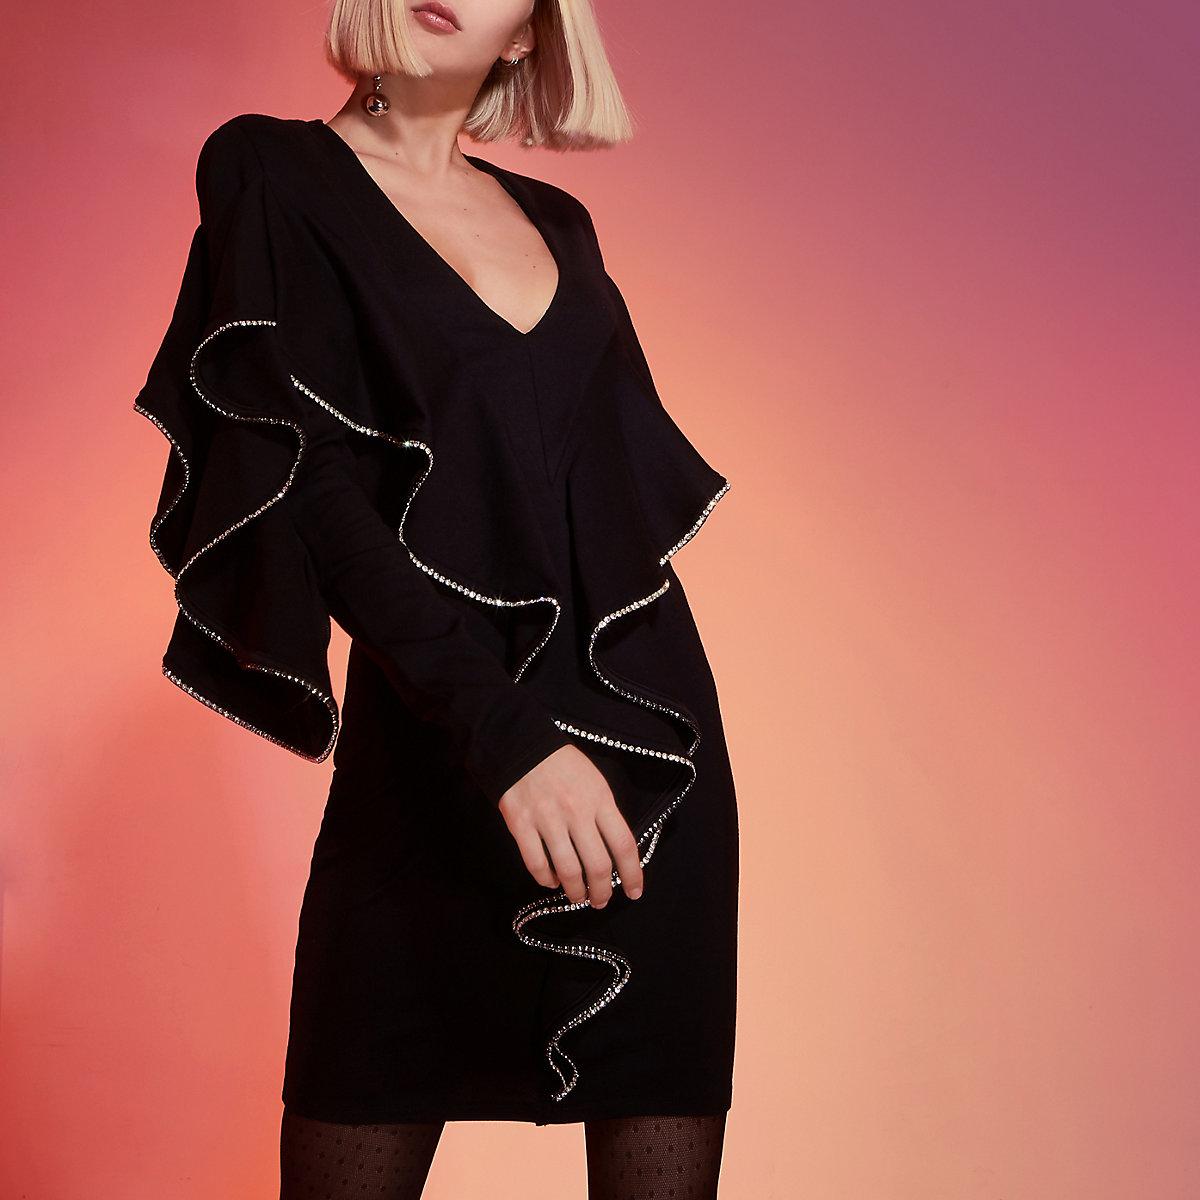 affd94cb18 Black RI Studio embellished frill dress - Dresses - Sale - women